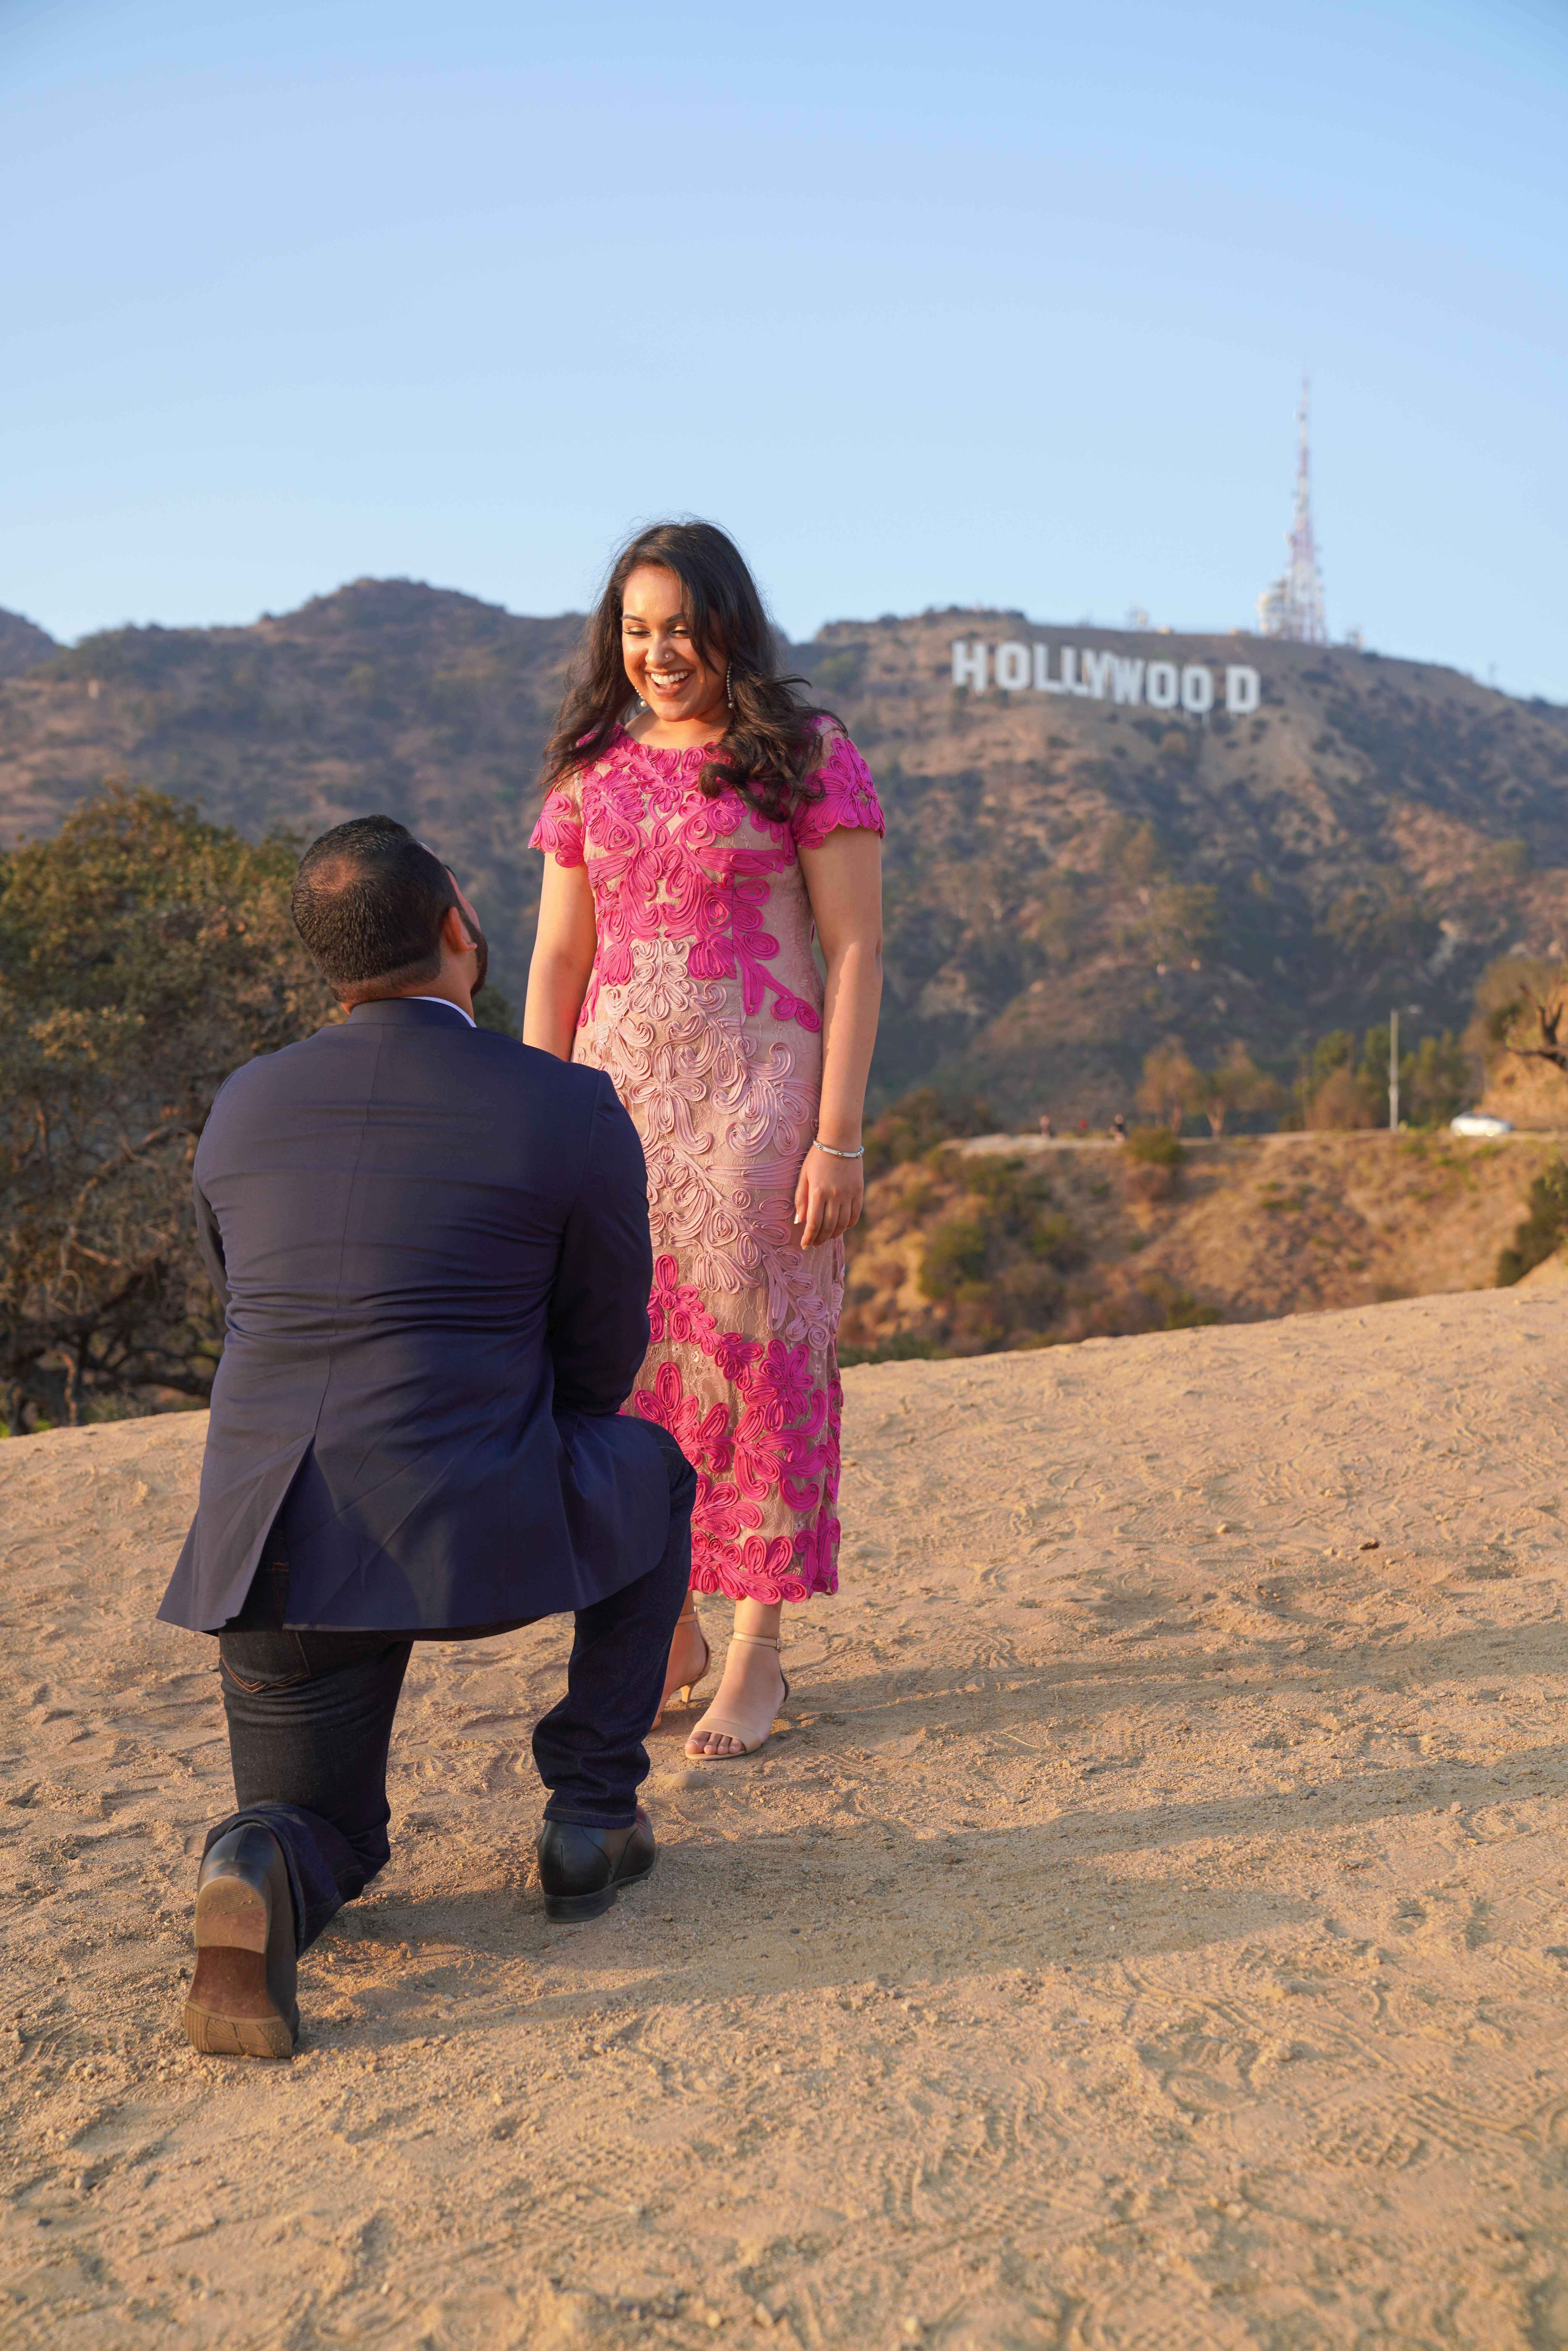 perfect proposals hilltop hollywood sign backdrop